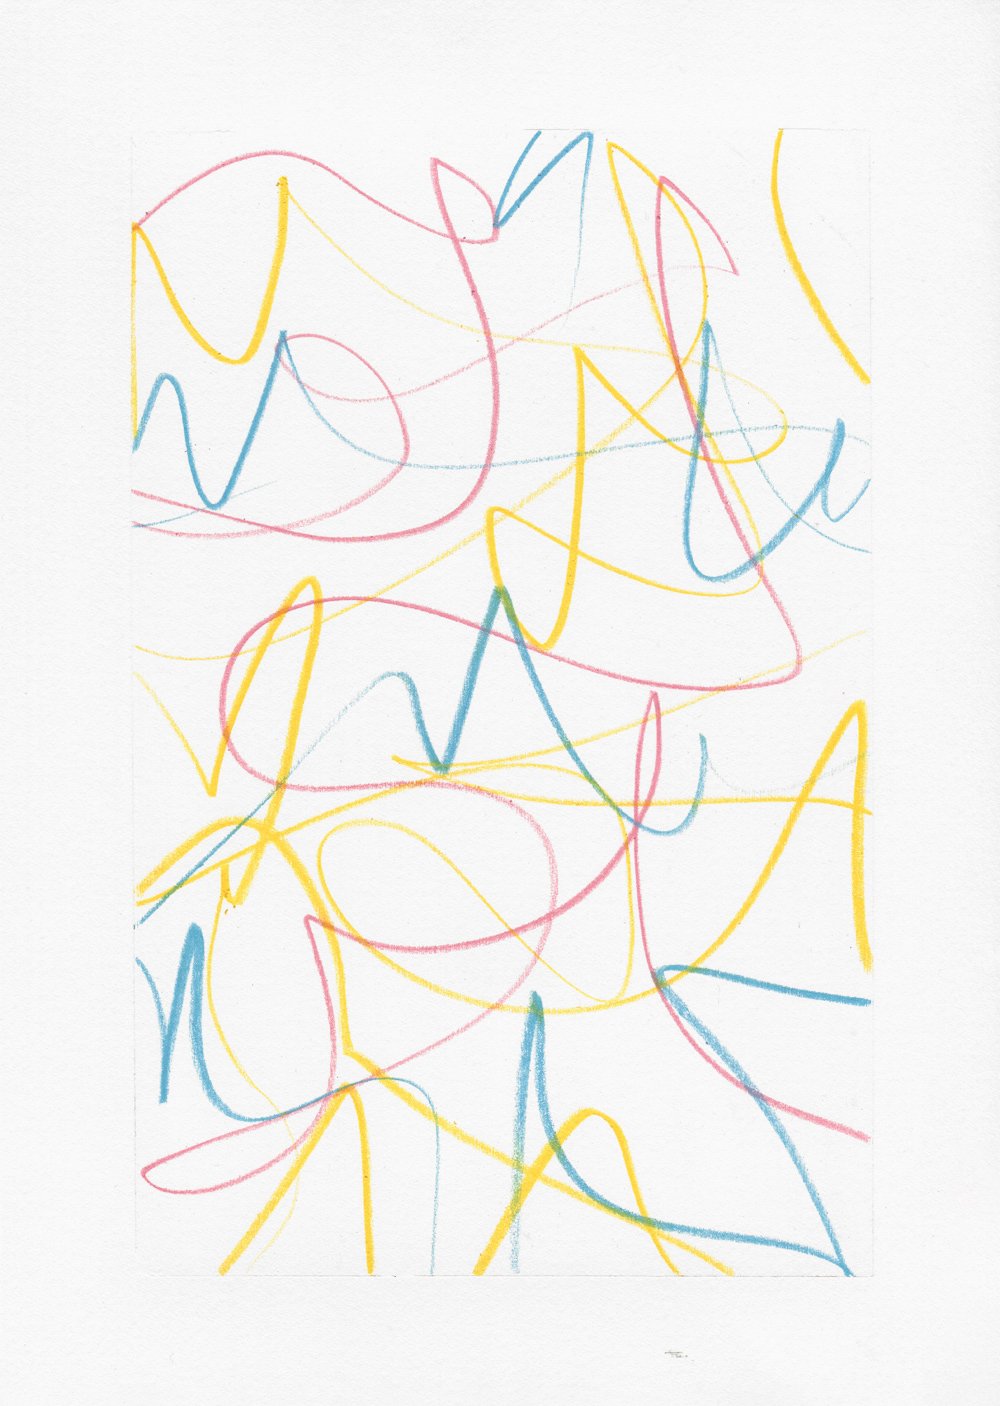 james-watkins-artist-artist-11